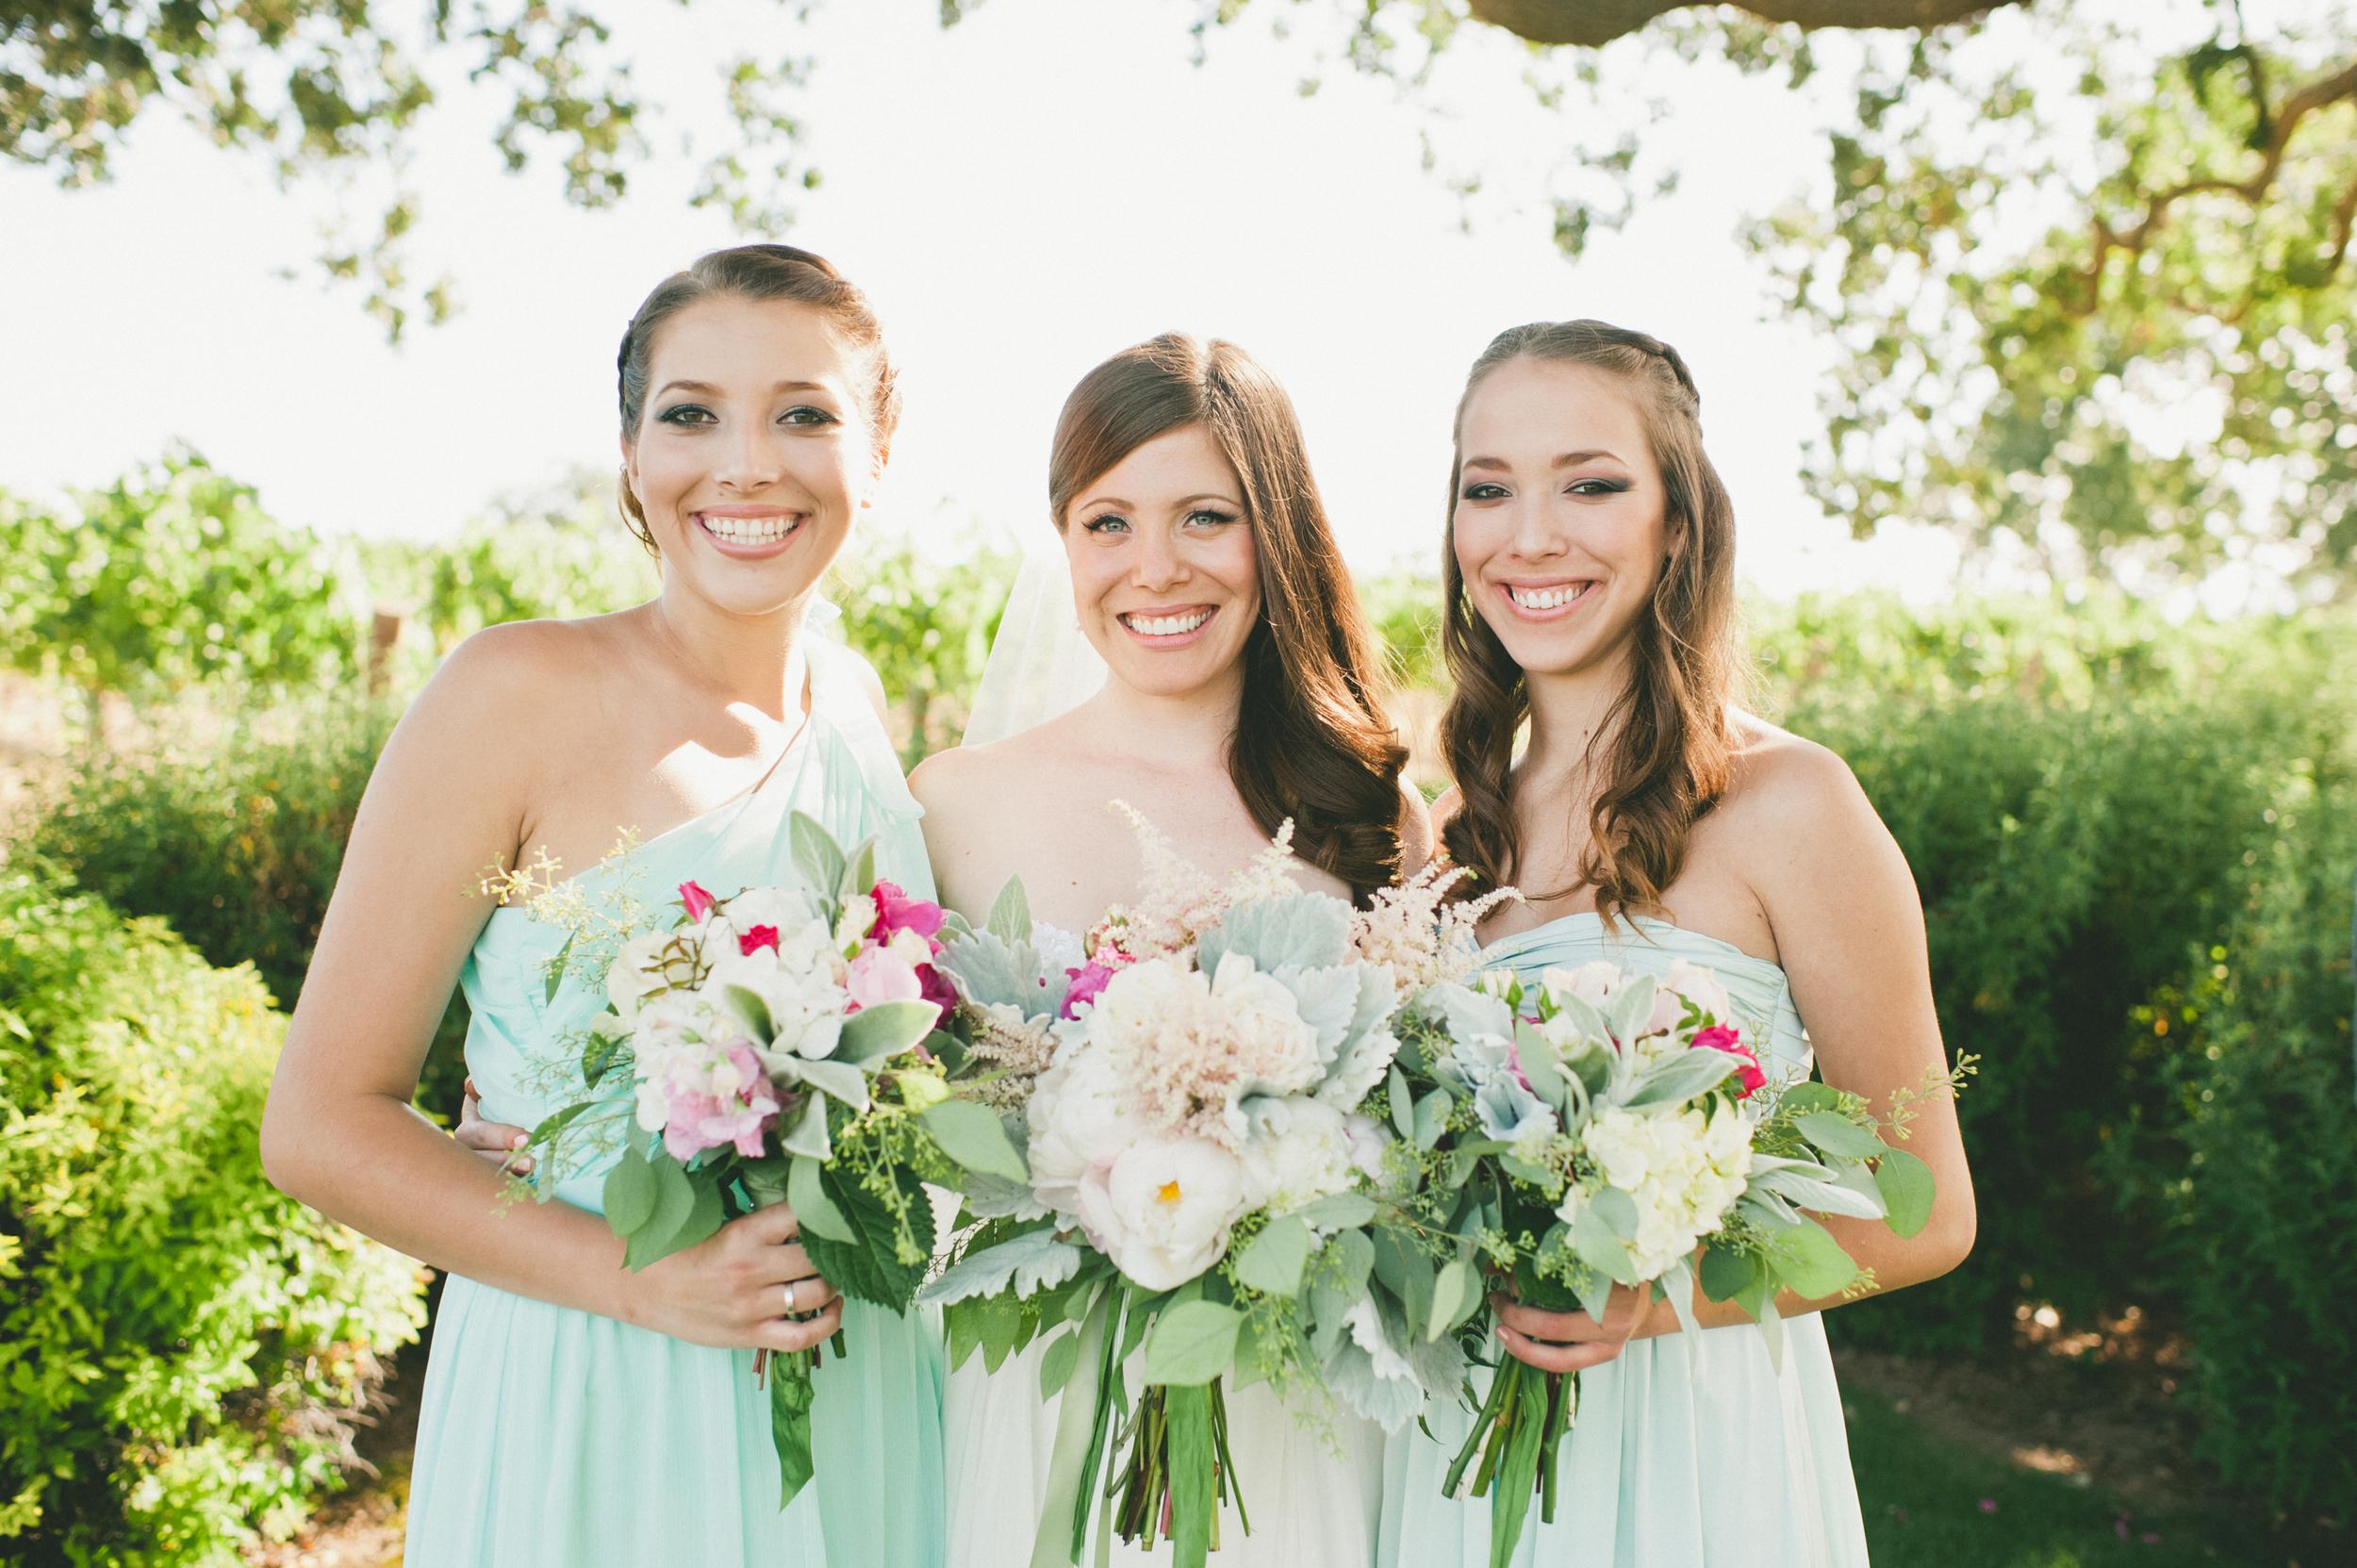 Passion Flowers Design Weddings Santa Ynez Valley Gainey Vineyard Onelove Photography.jpg